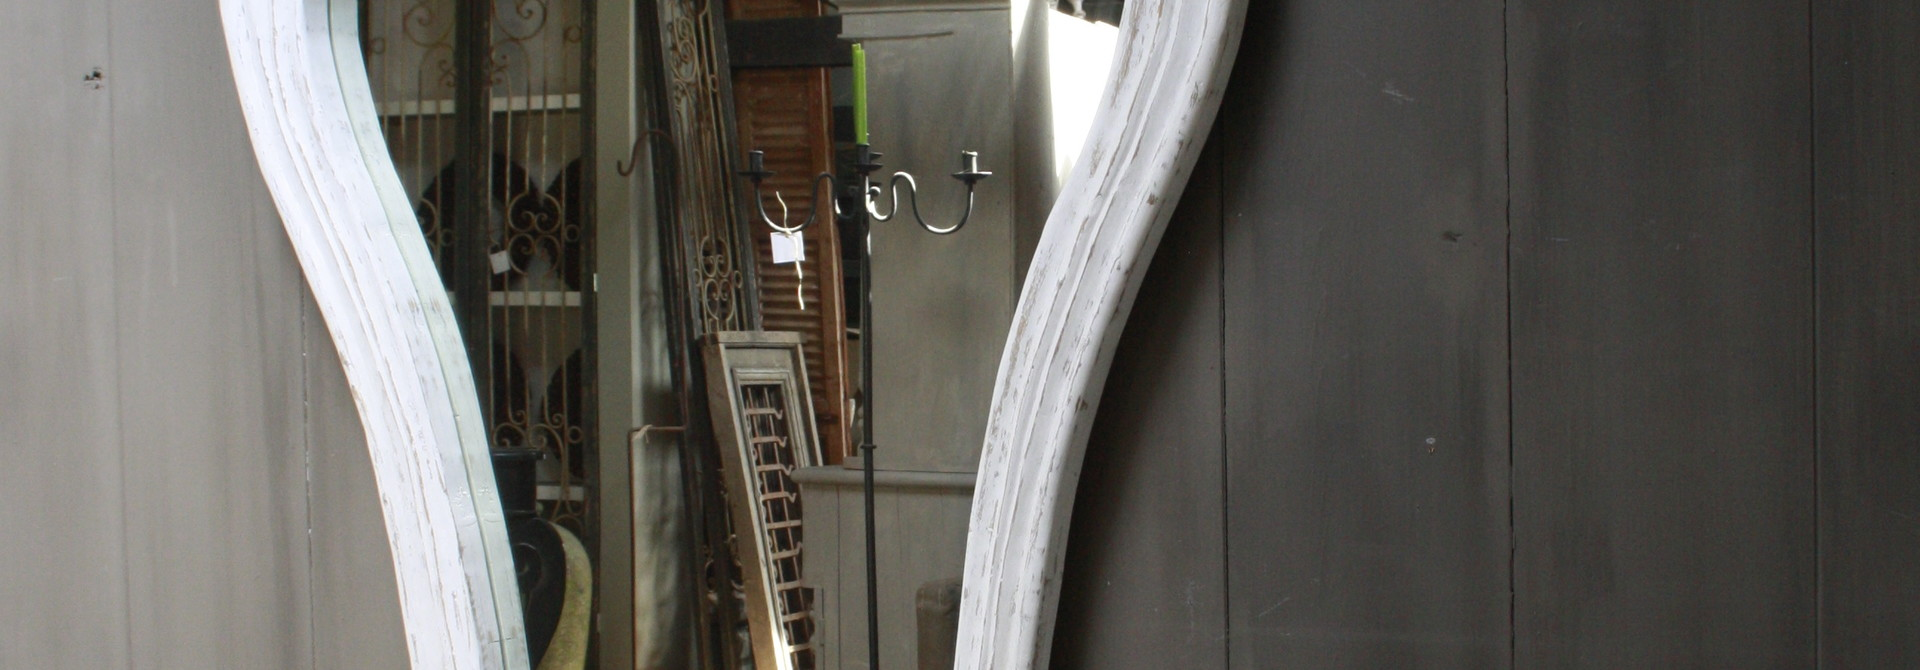 Garcia Sierspiegel  wit hout met kuif 180 cm